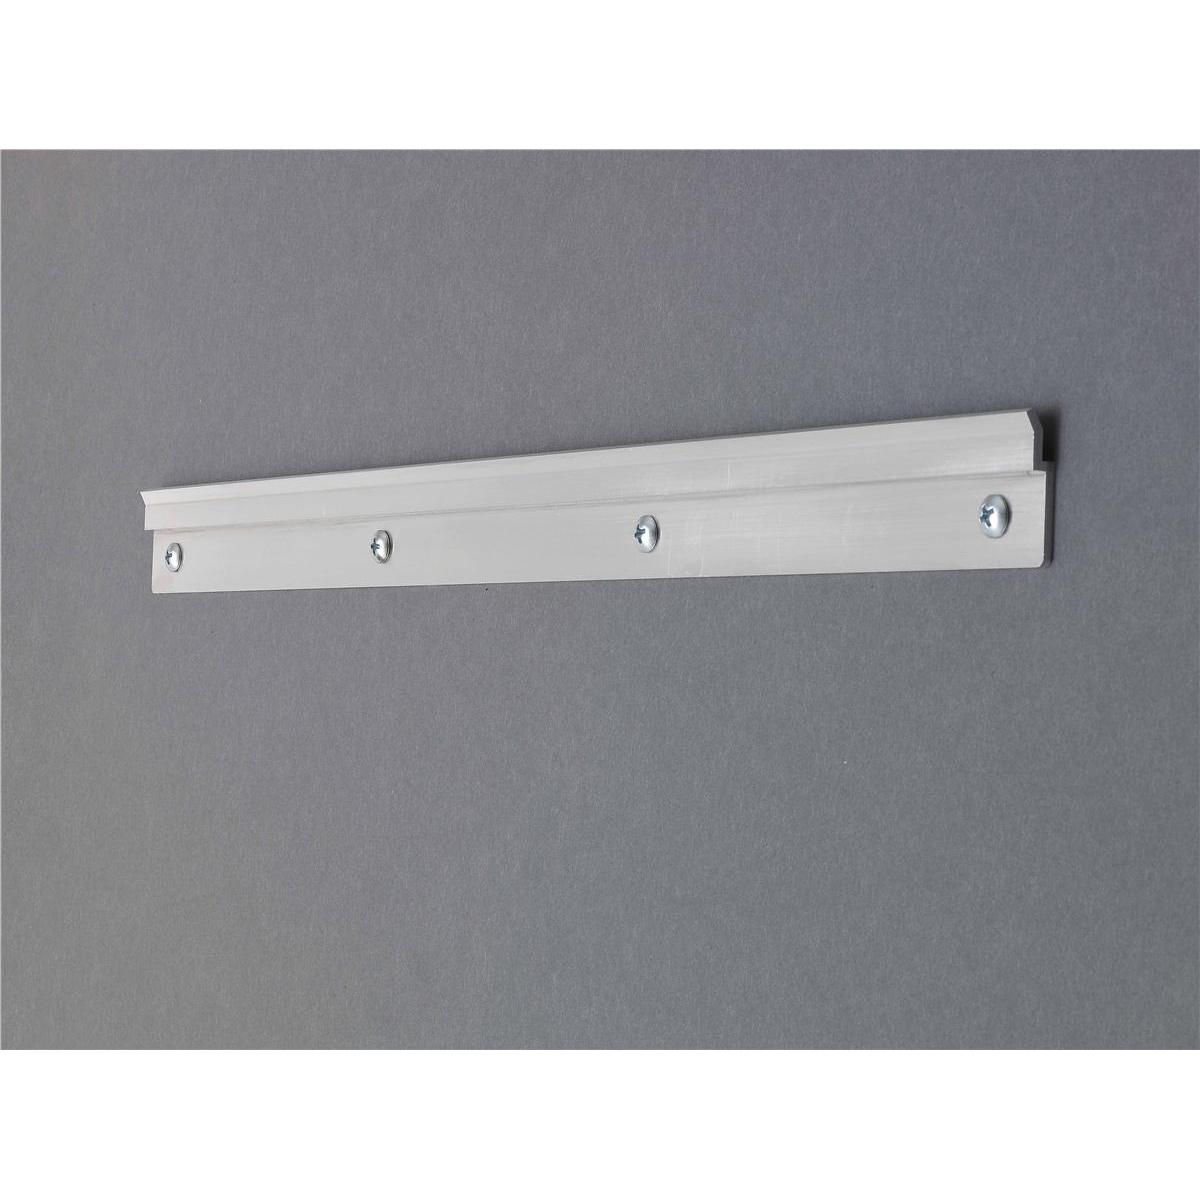 Nobo Noticeboard for Exterior Glazed Case Lockable Magnetic Steel 6xA4 W692xD45xH752mm Ref 1902578